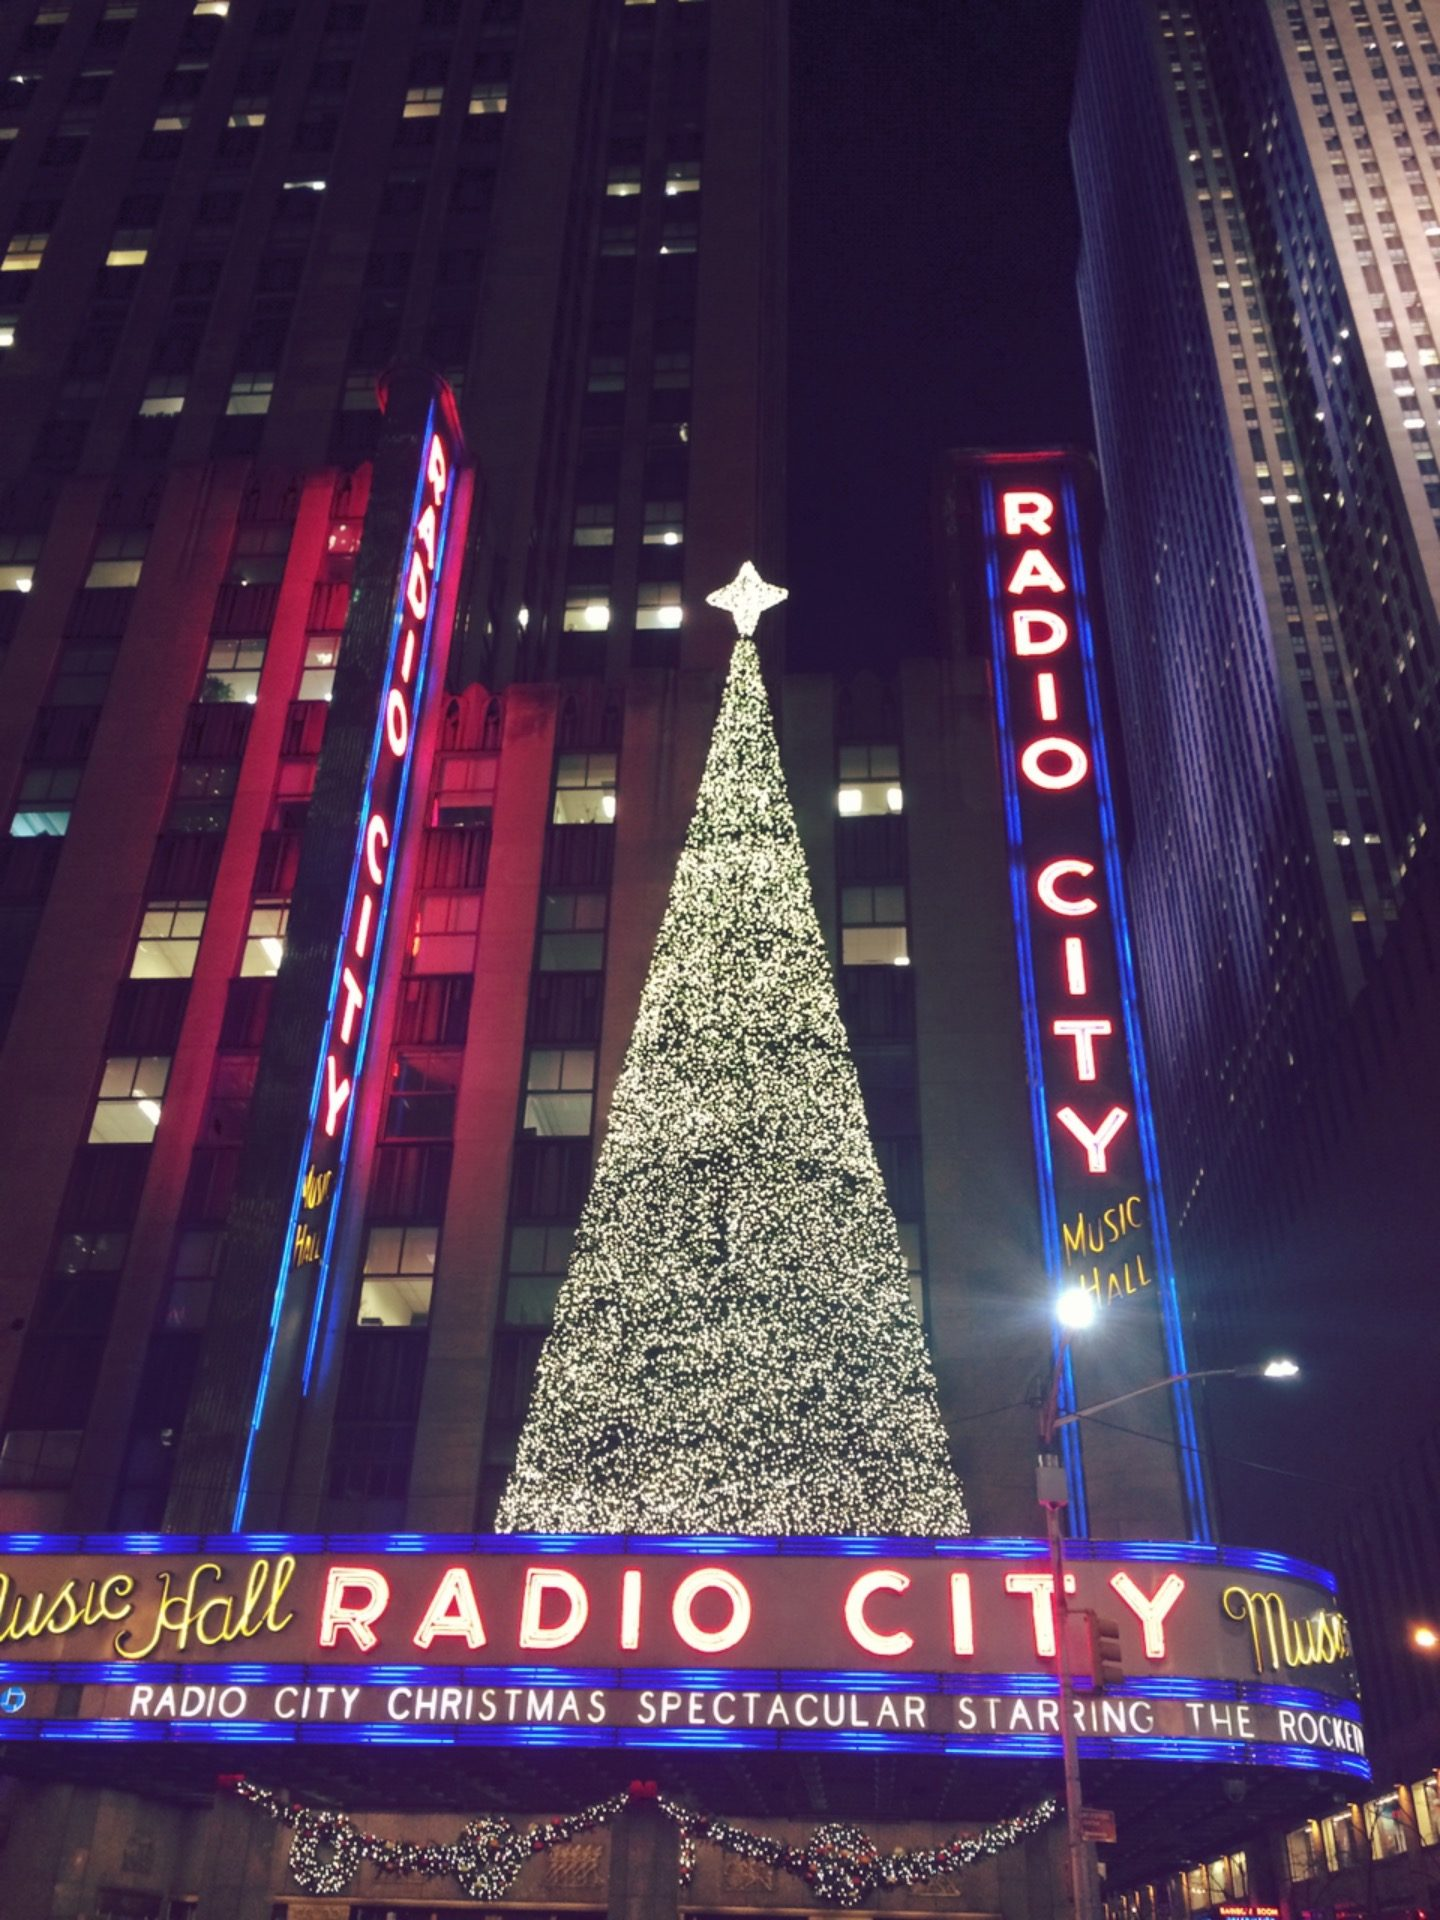 radiocitymusichall_christmas-season-newyork